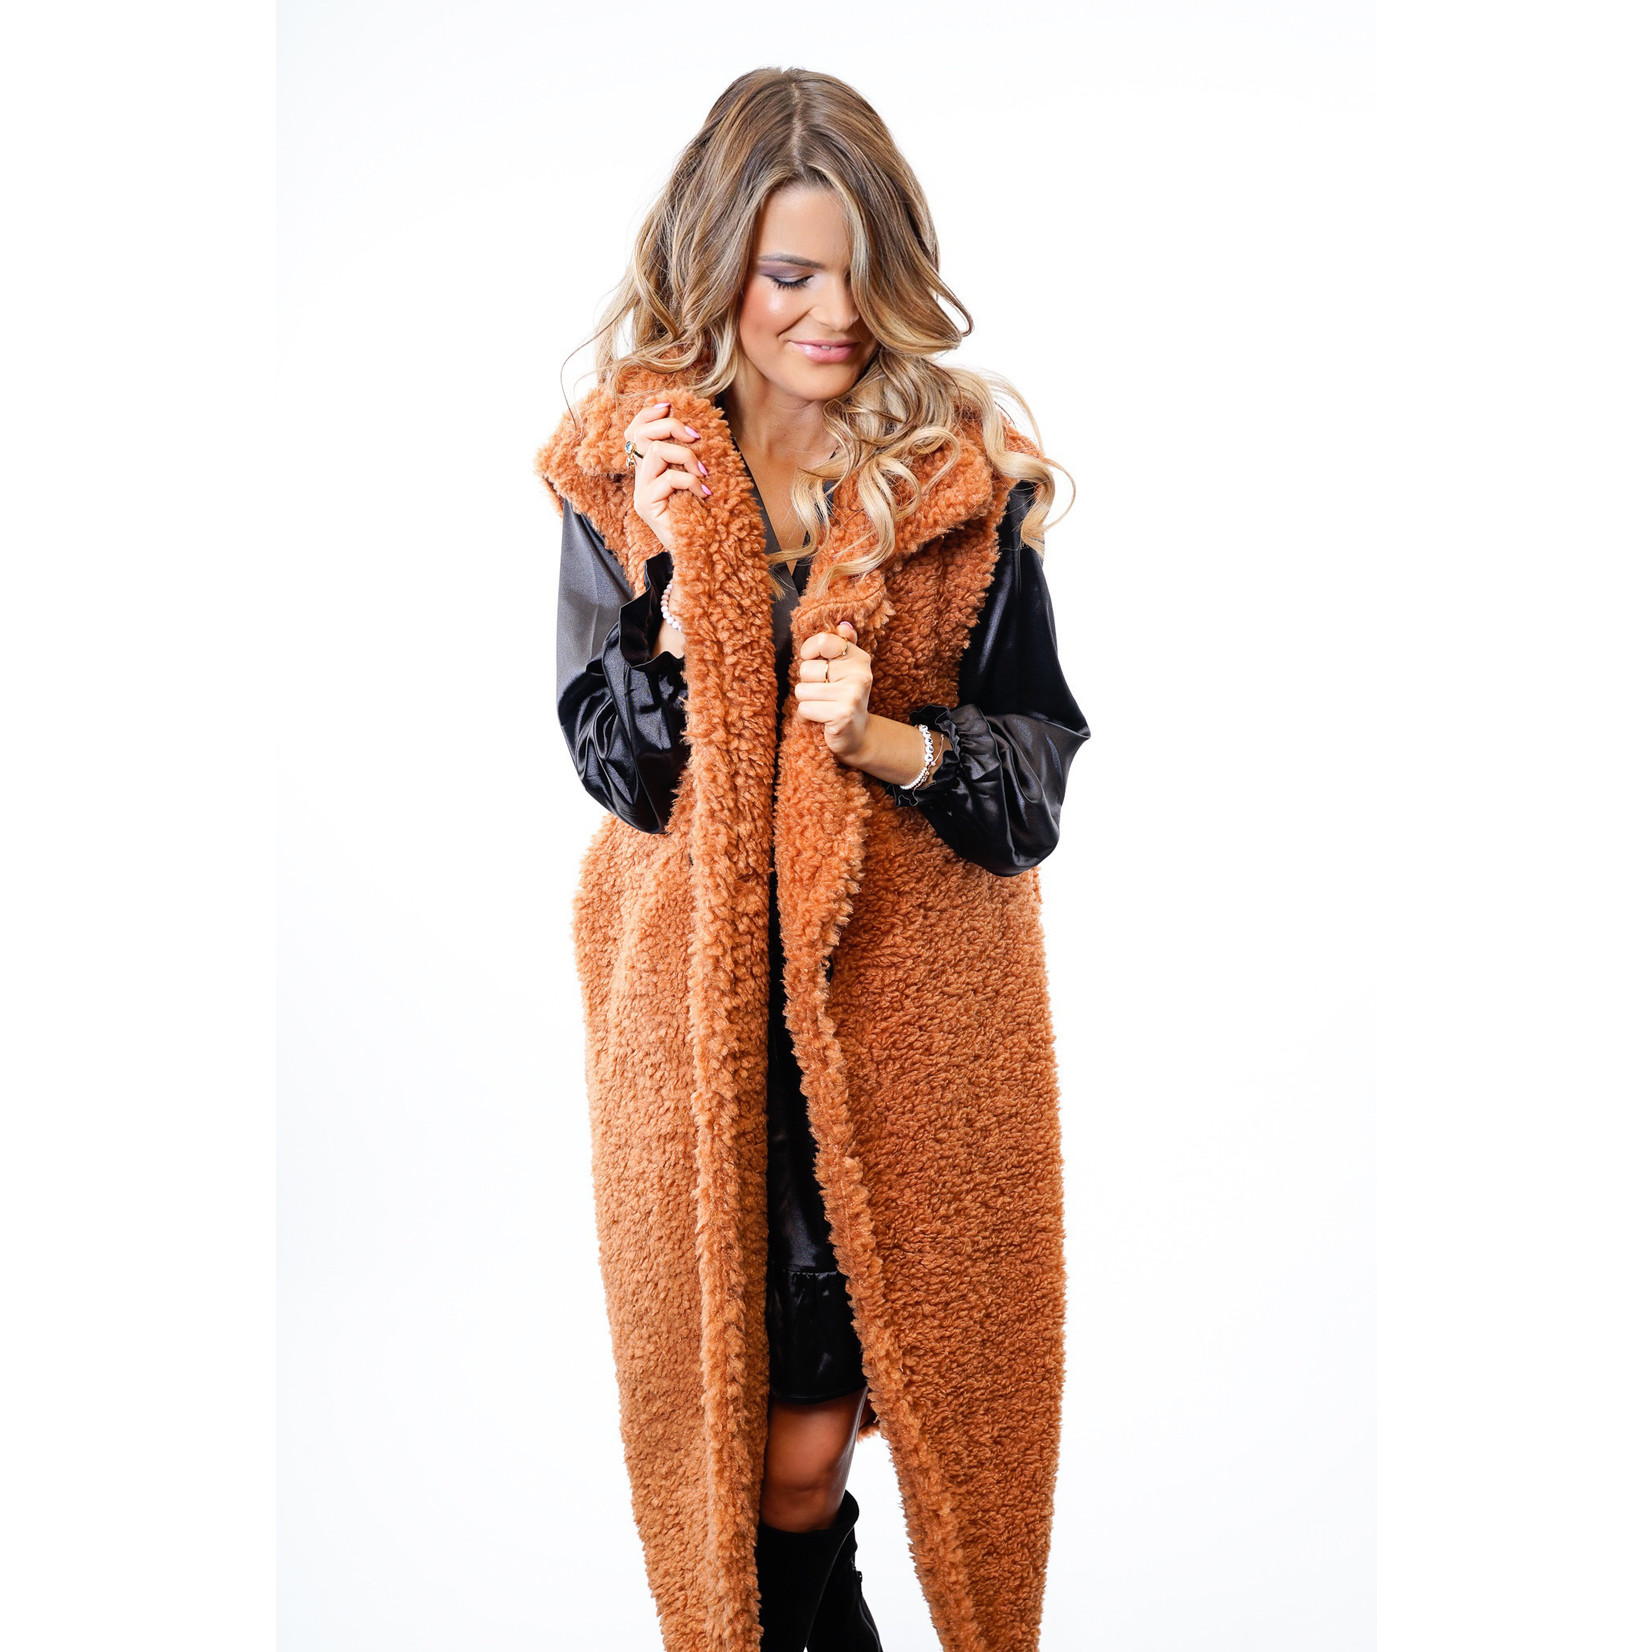 Yentl K Teddy Coat Sleevless 40